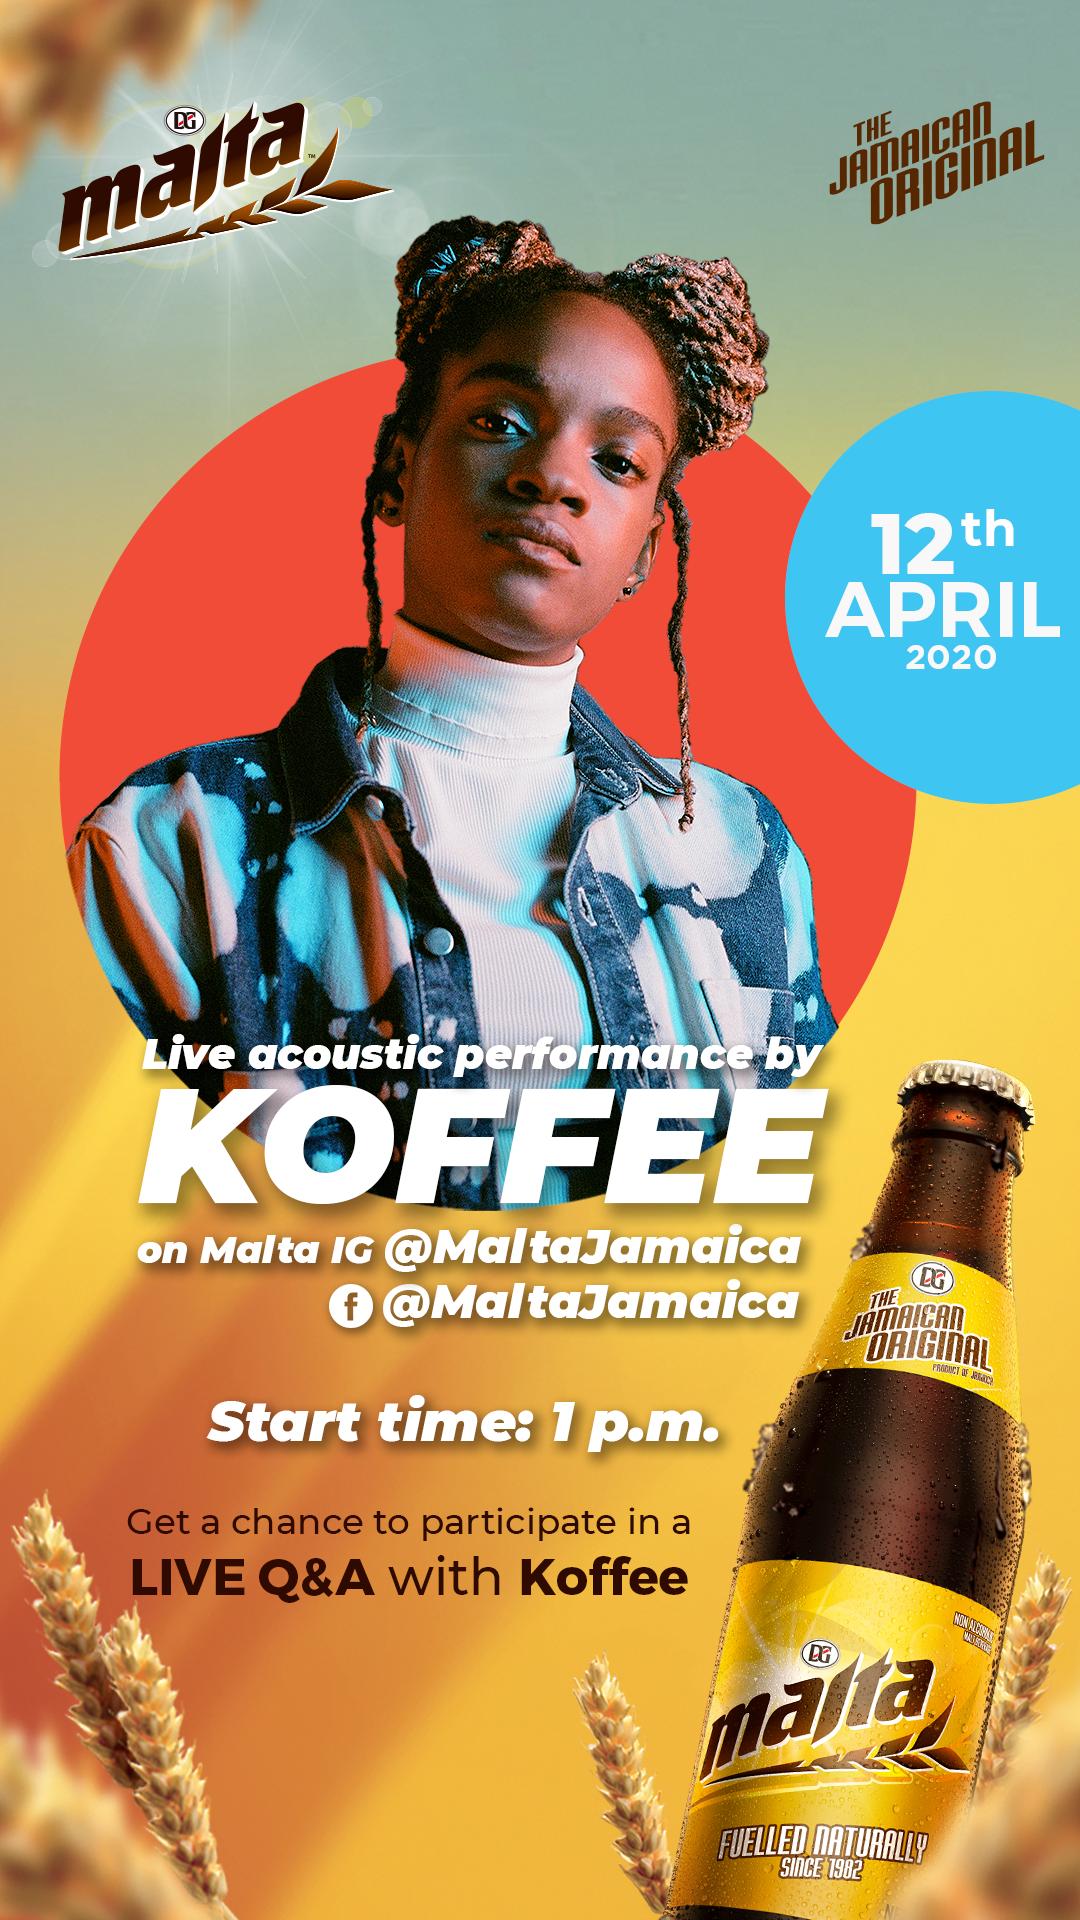 Koffee Live Online Concert